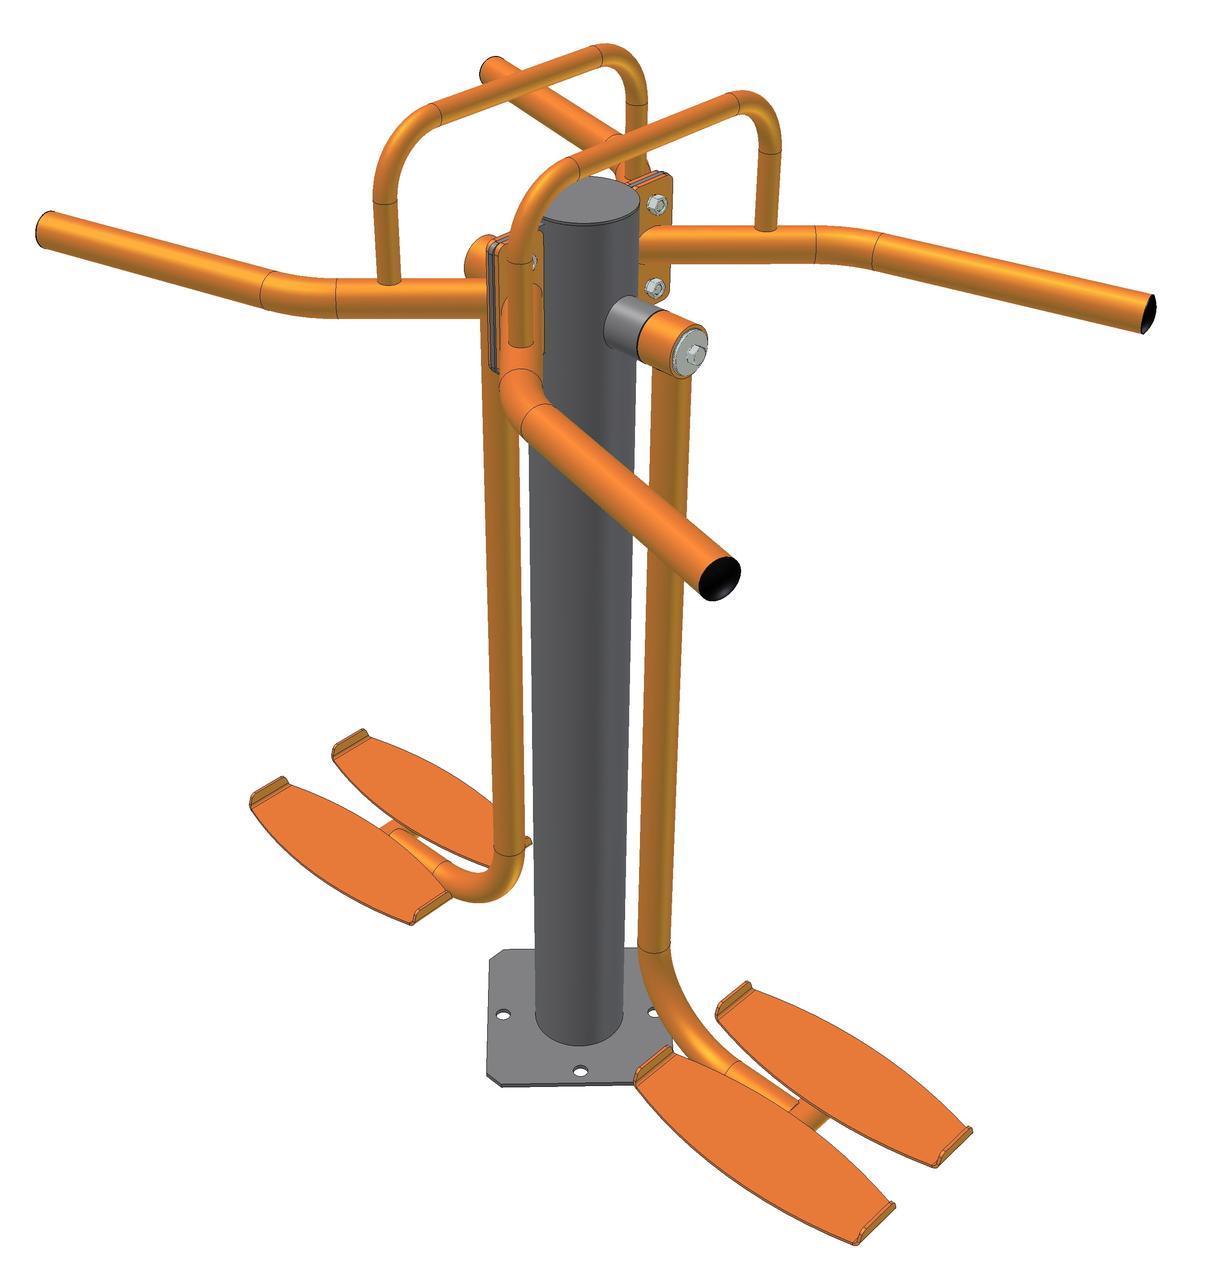 Тренажер для ягодичных мышц Маятник